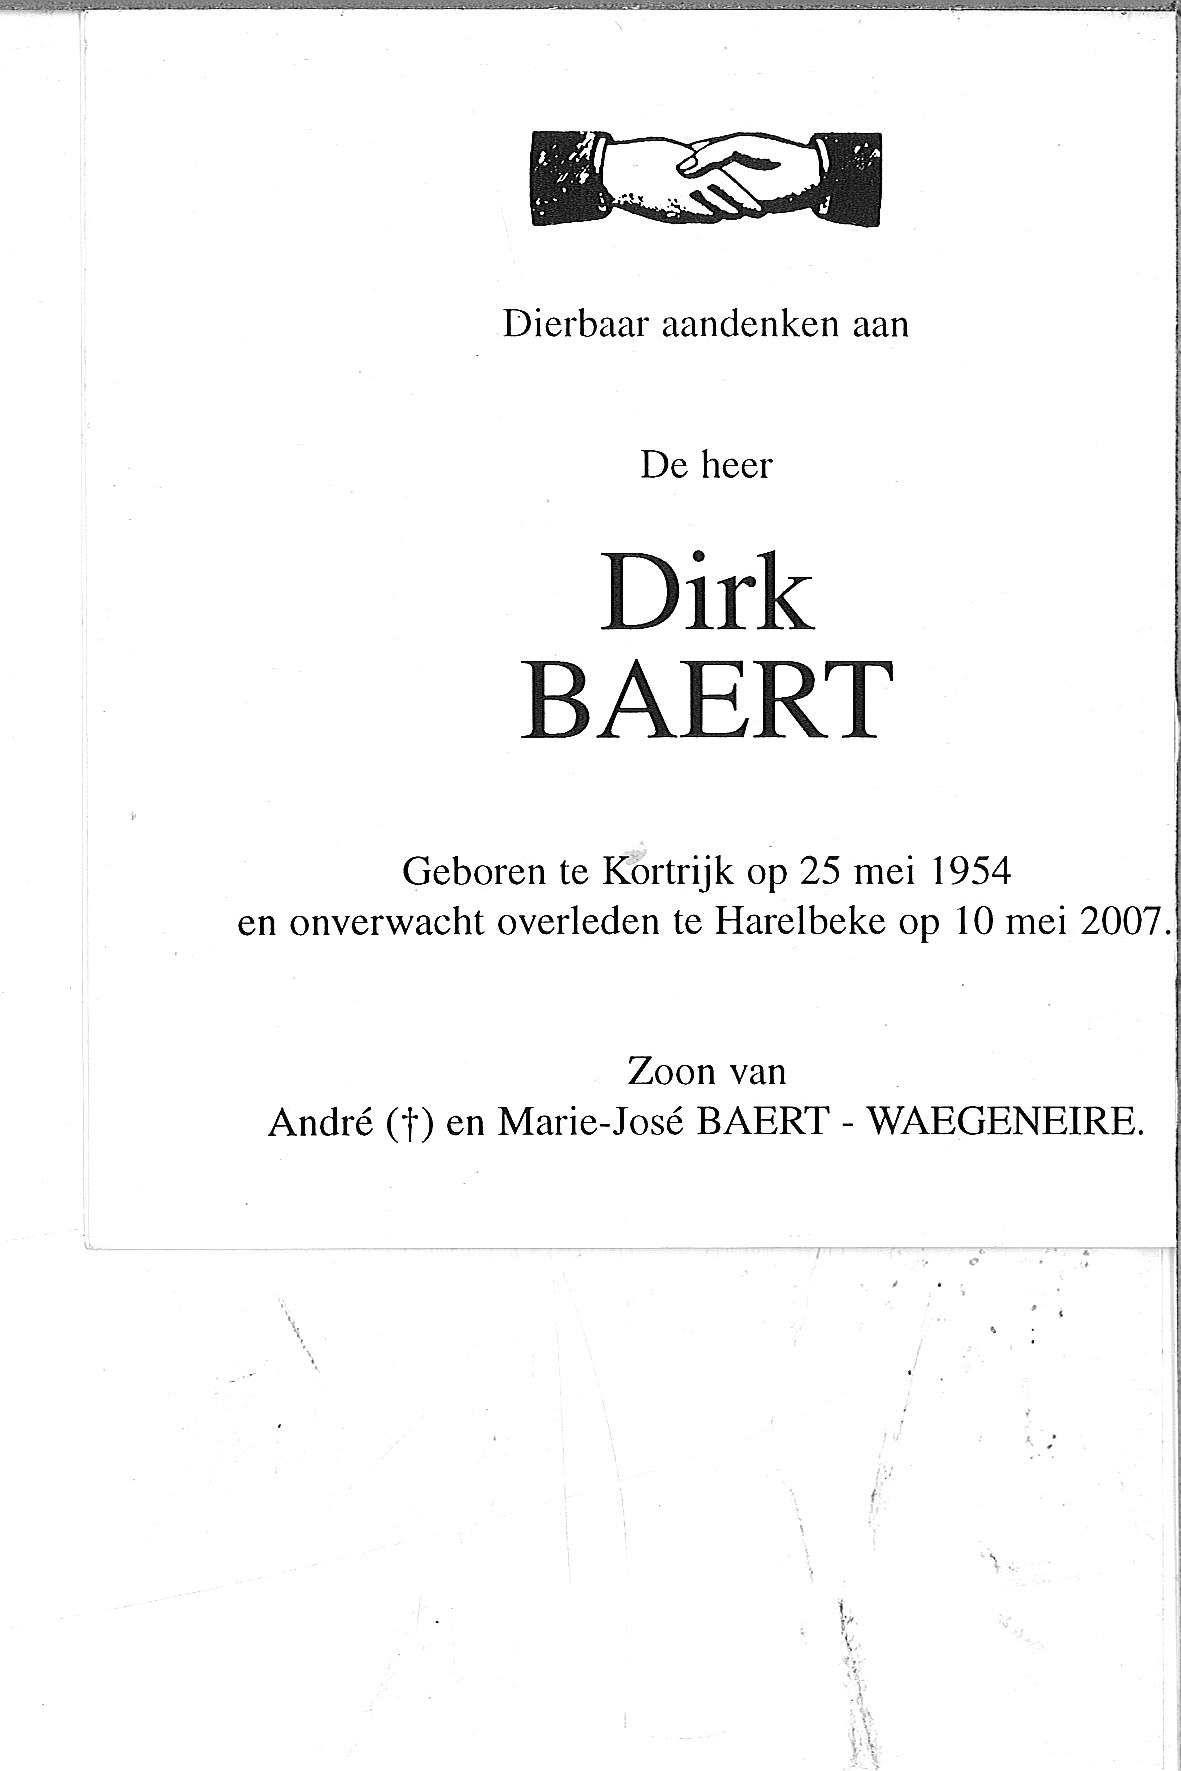 Dirk(2007)20130826134141_00036.jpg